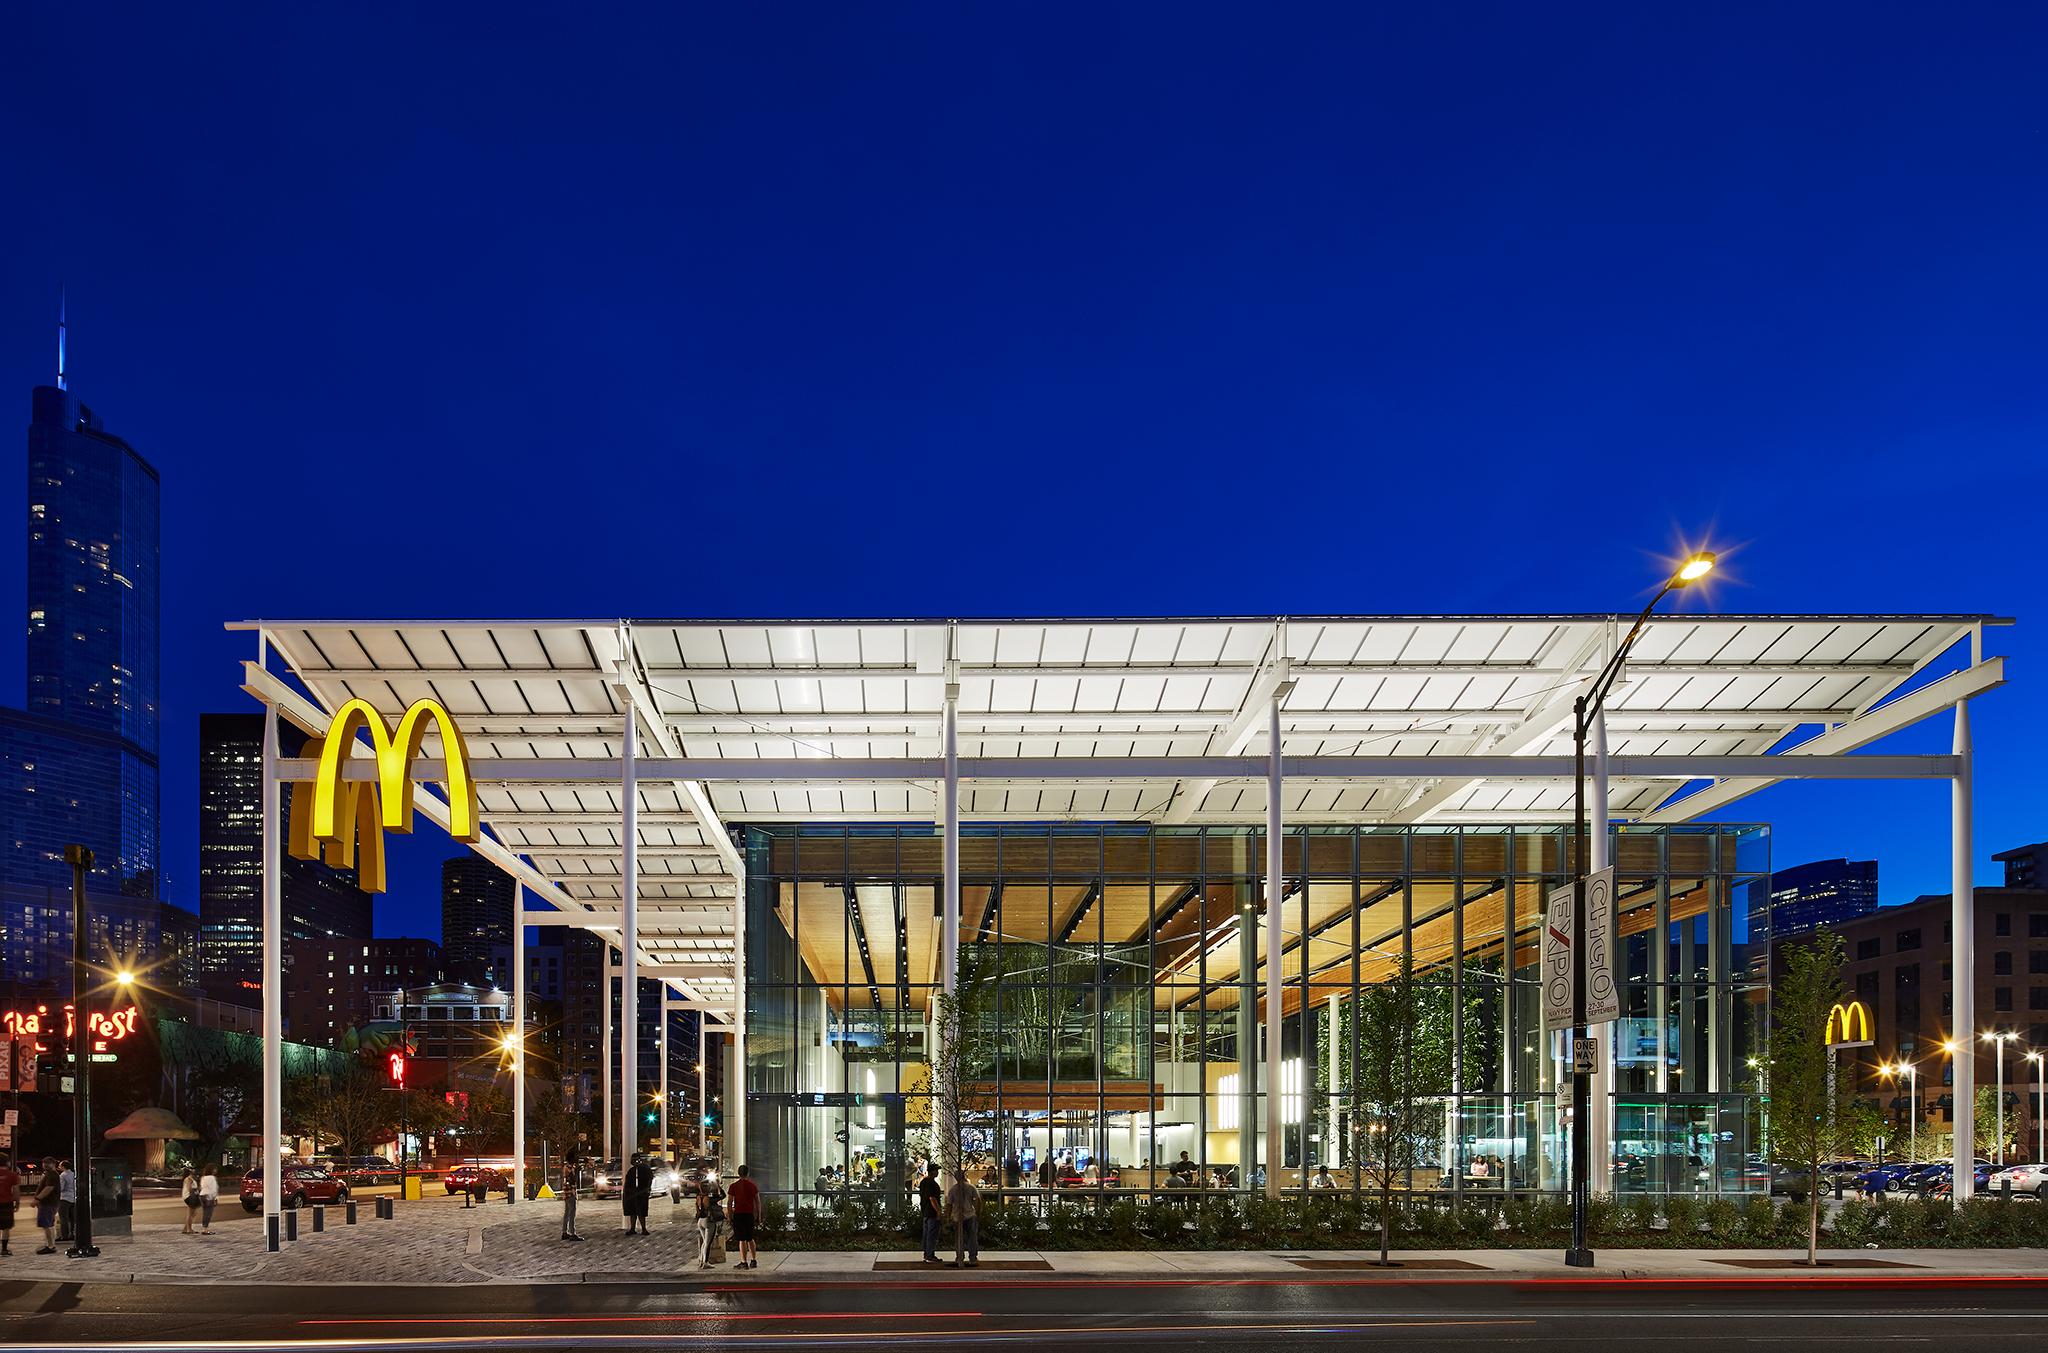 McDonald's Chicago Flagship